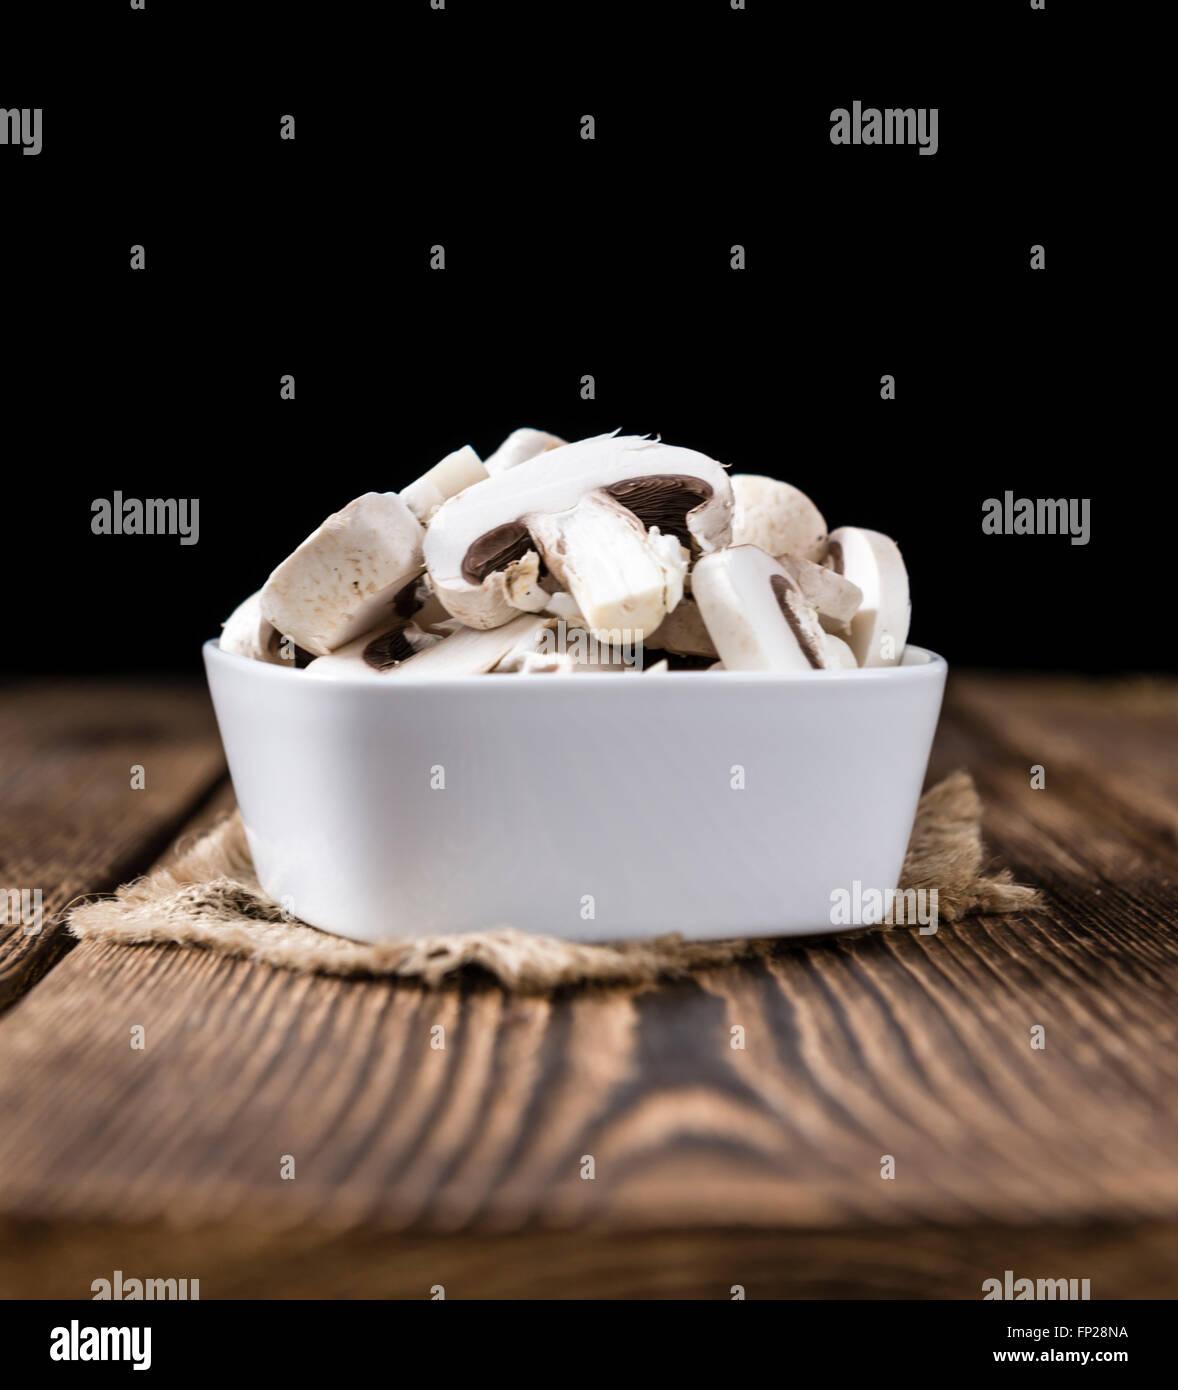 Portion of white Mushrooms (close-up shot) on vintage wooden background - Stock Image